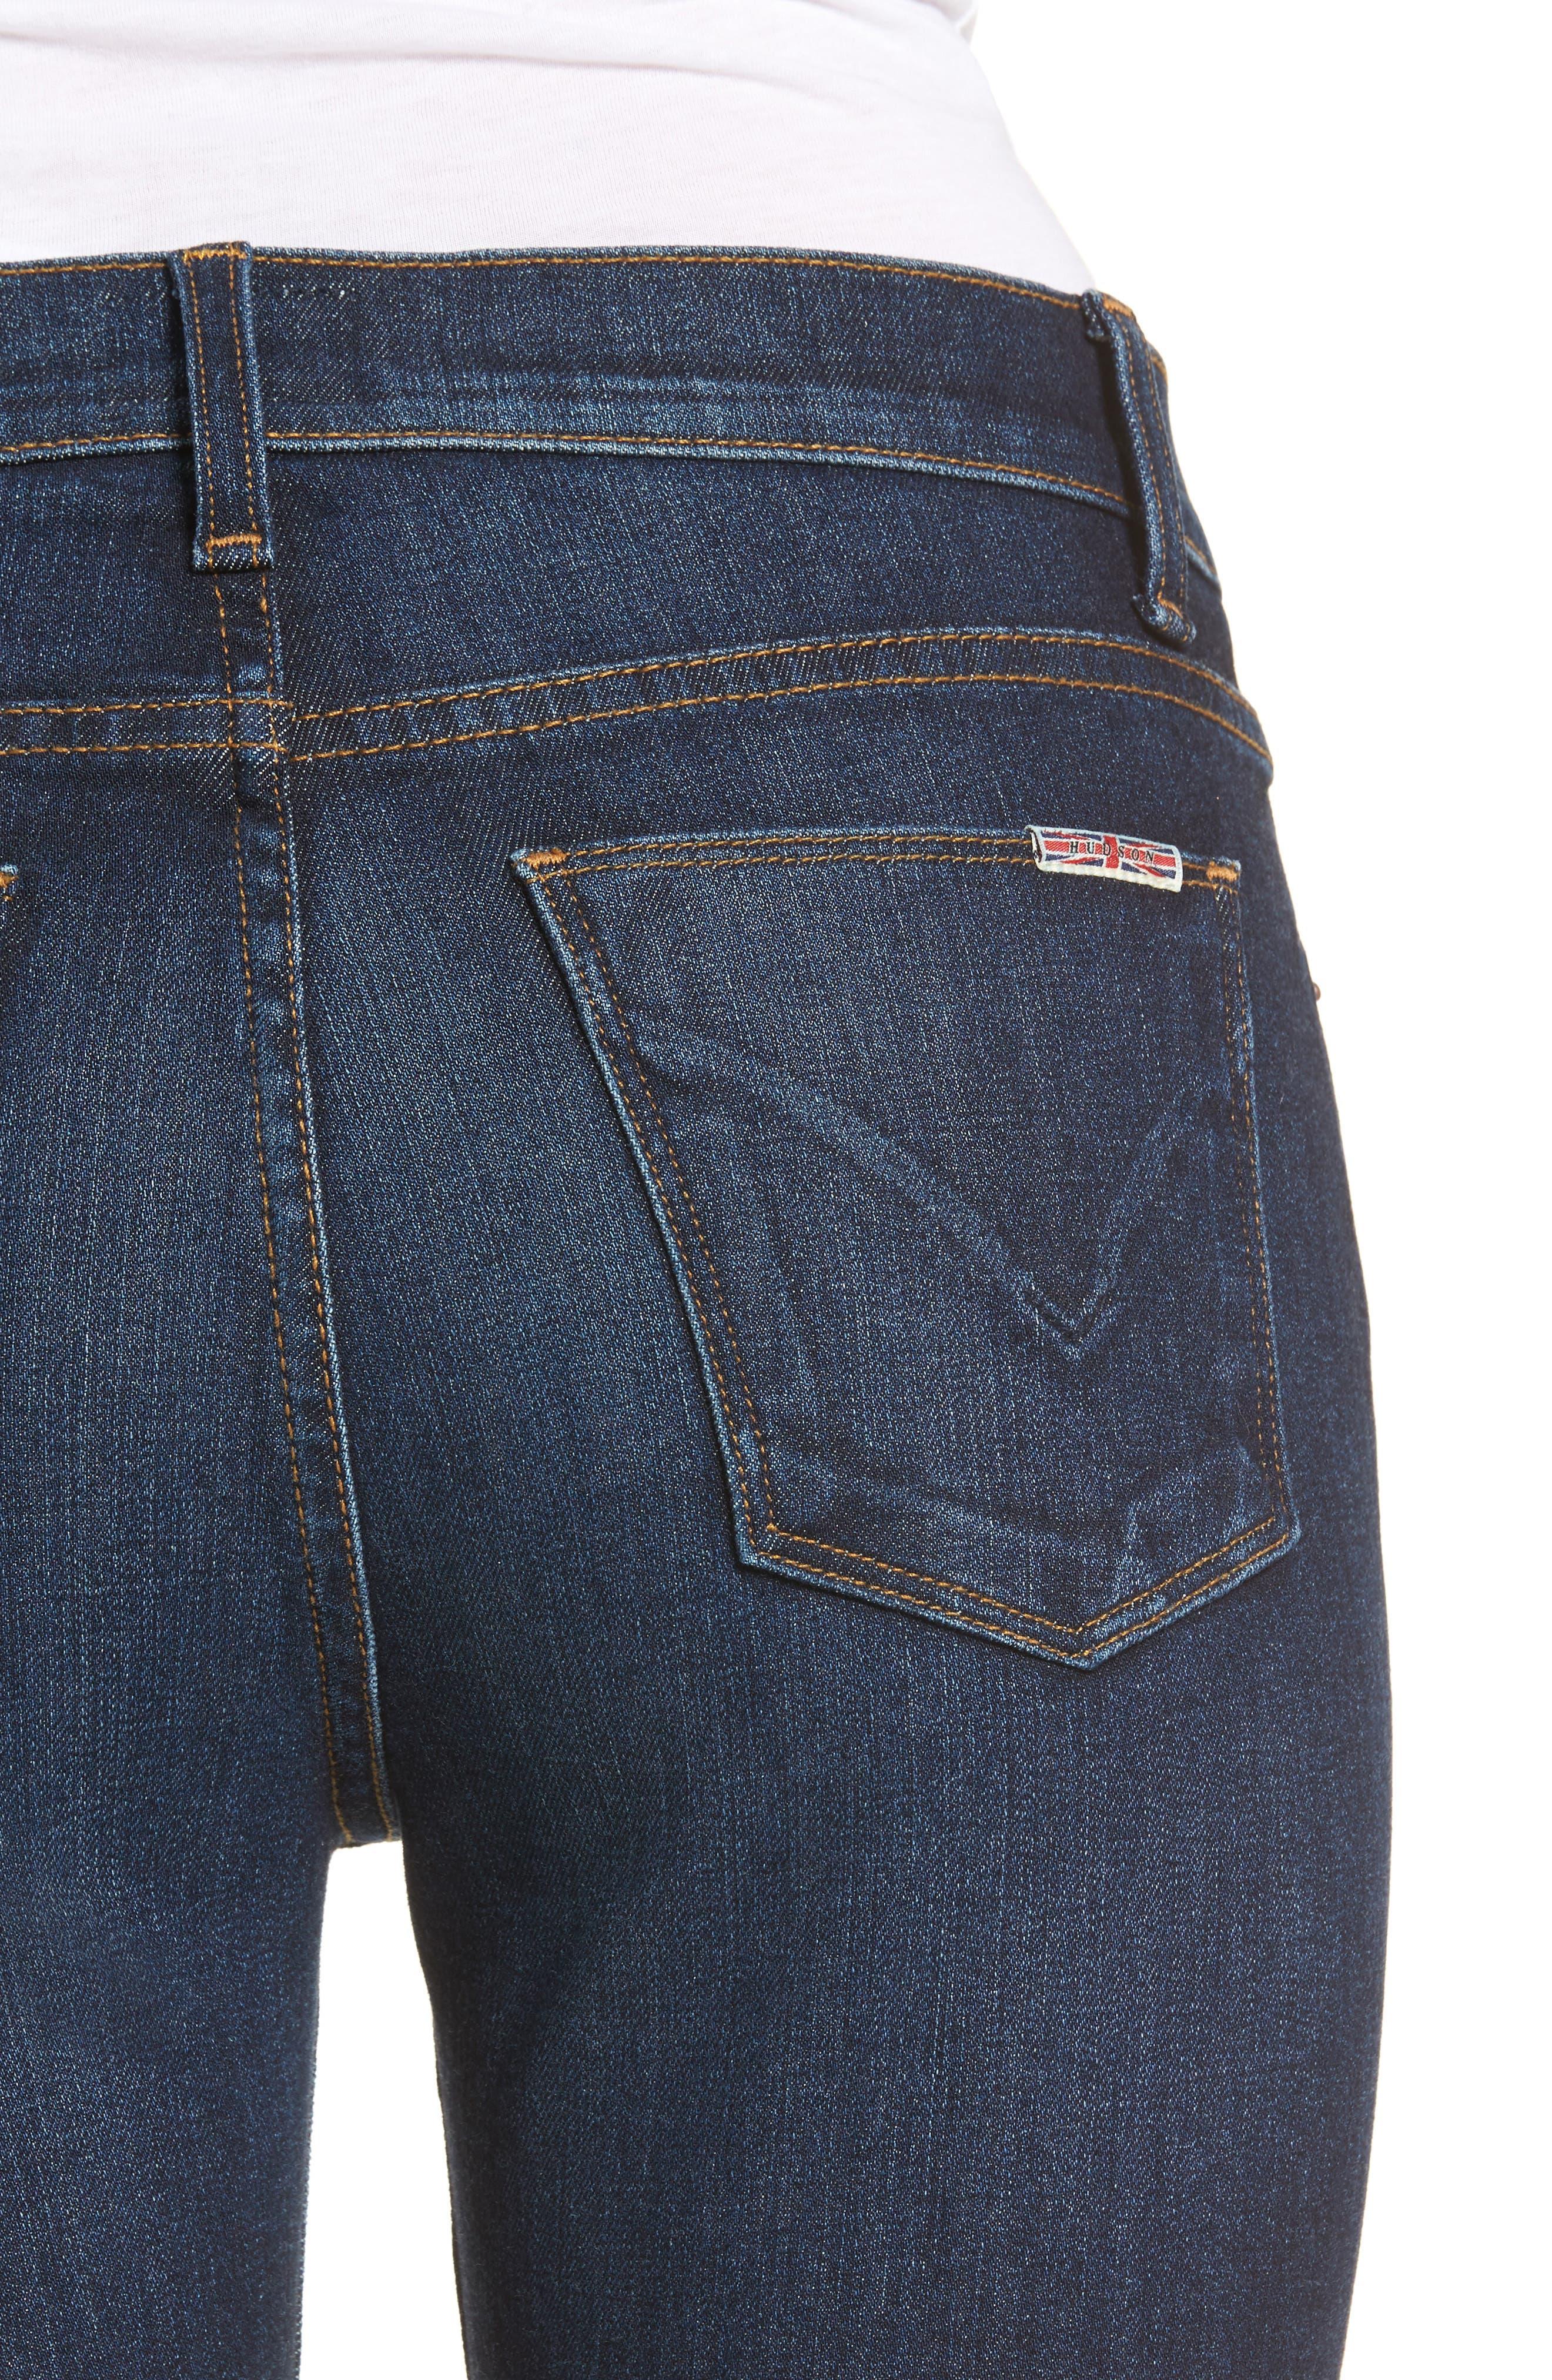 Barbara High Waist Ankle Super Skinny Jeans,                             Alternate thumbnail 7, color,